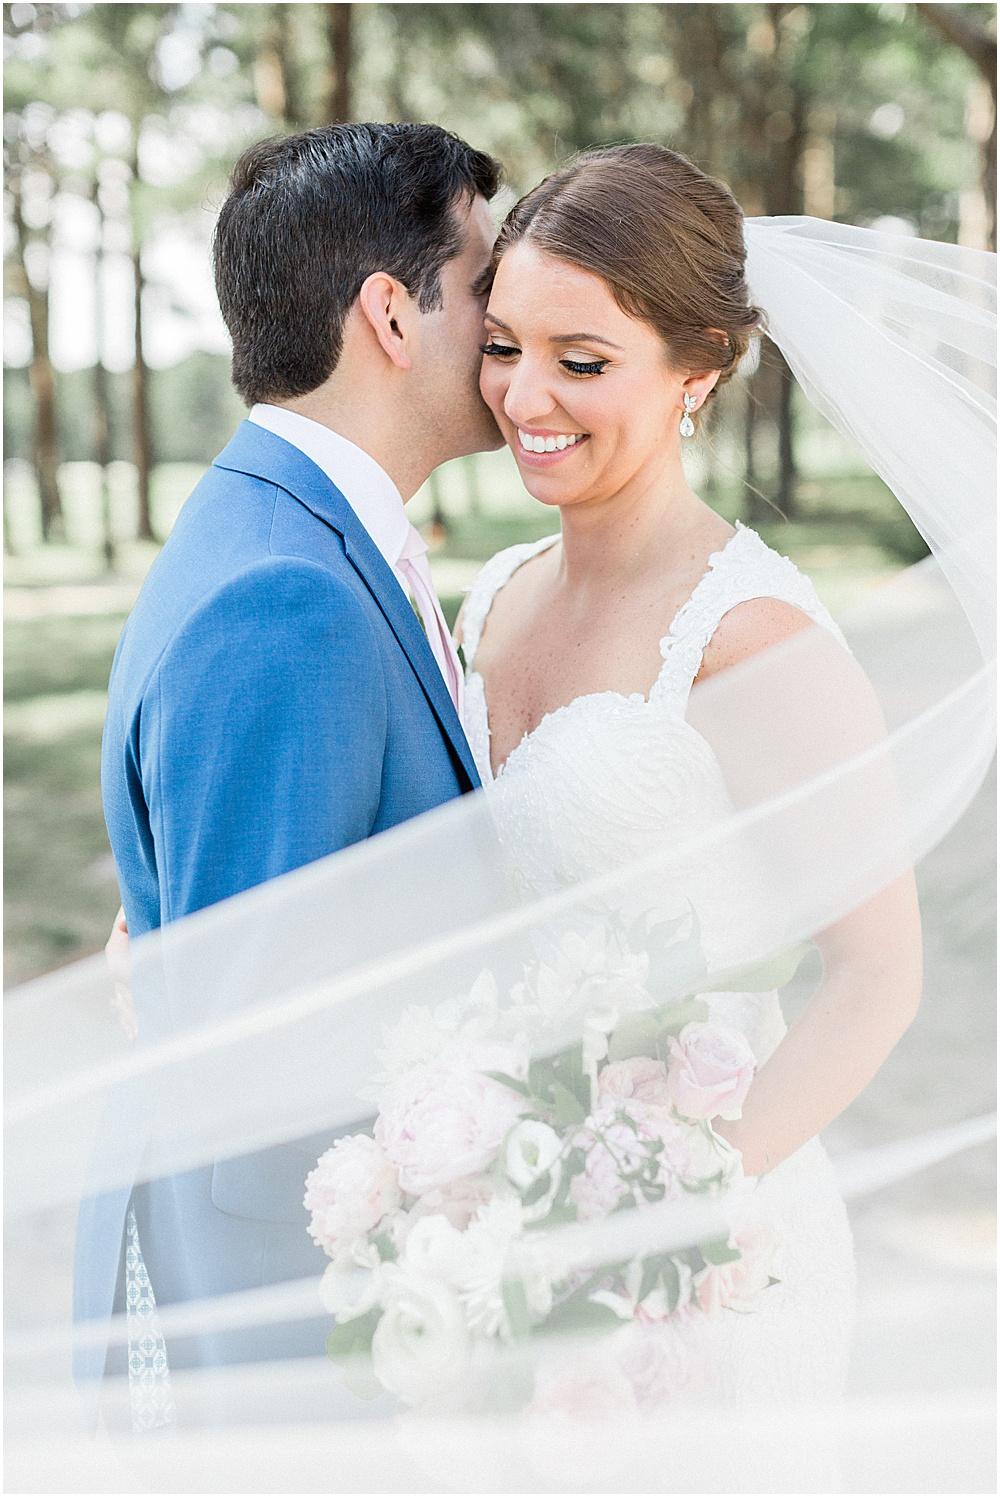 willowbend_country_club_colleen_brett_wild_dahlia_cw_events_cape_cod_massachusetts_boston_wedding_photographer_meredith_jane_photography_photo_0580.jpg